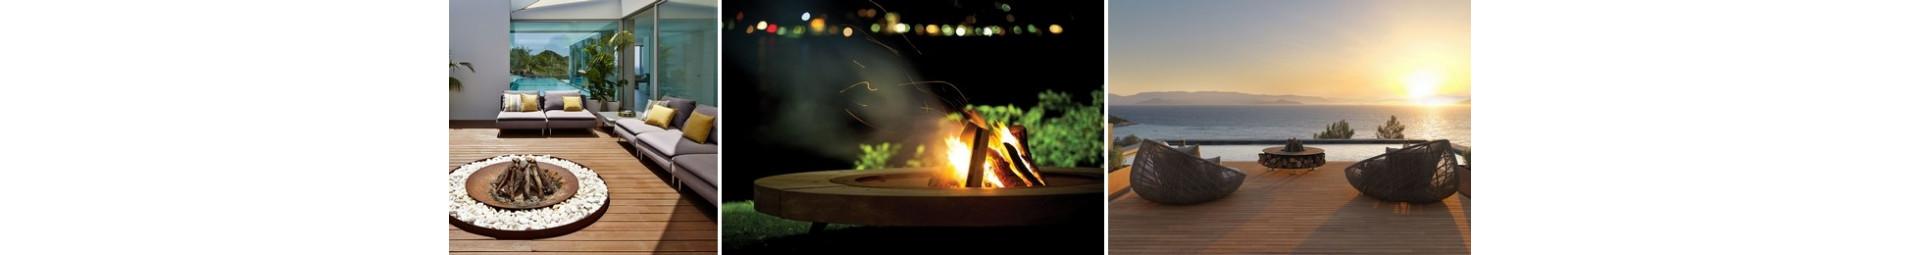 Barbecue et braséro